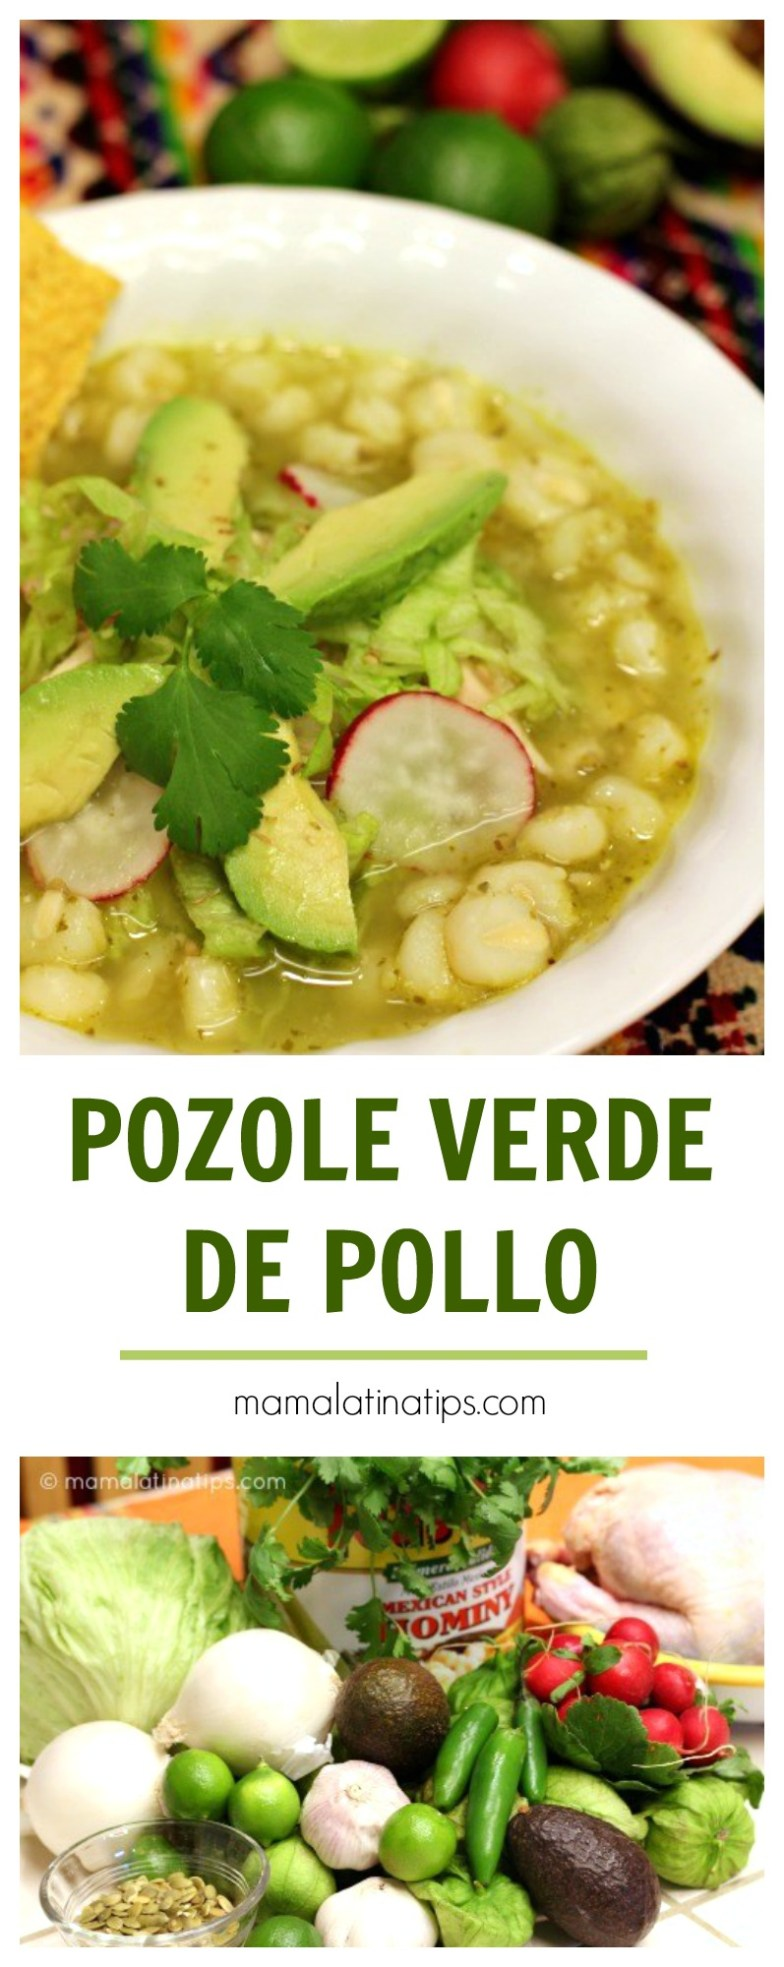 Receta de pozole verde de pollo mama latina tips - Como se hace pollo en salsa ...